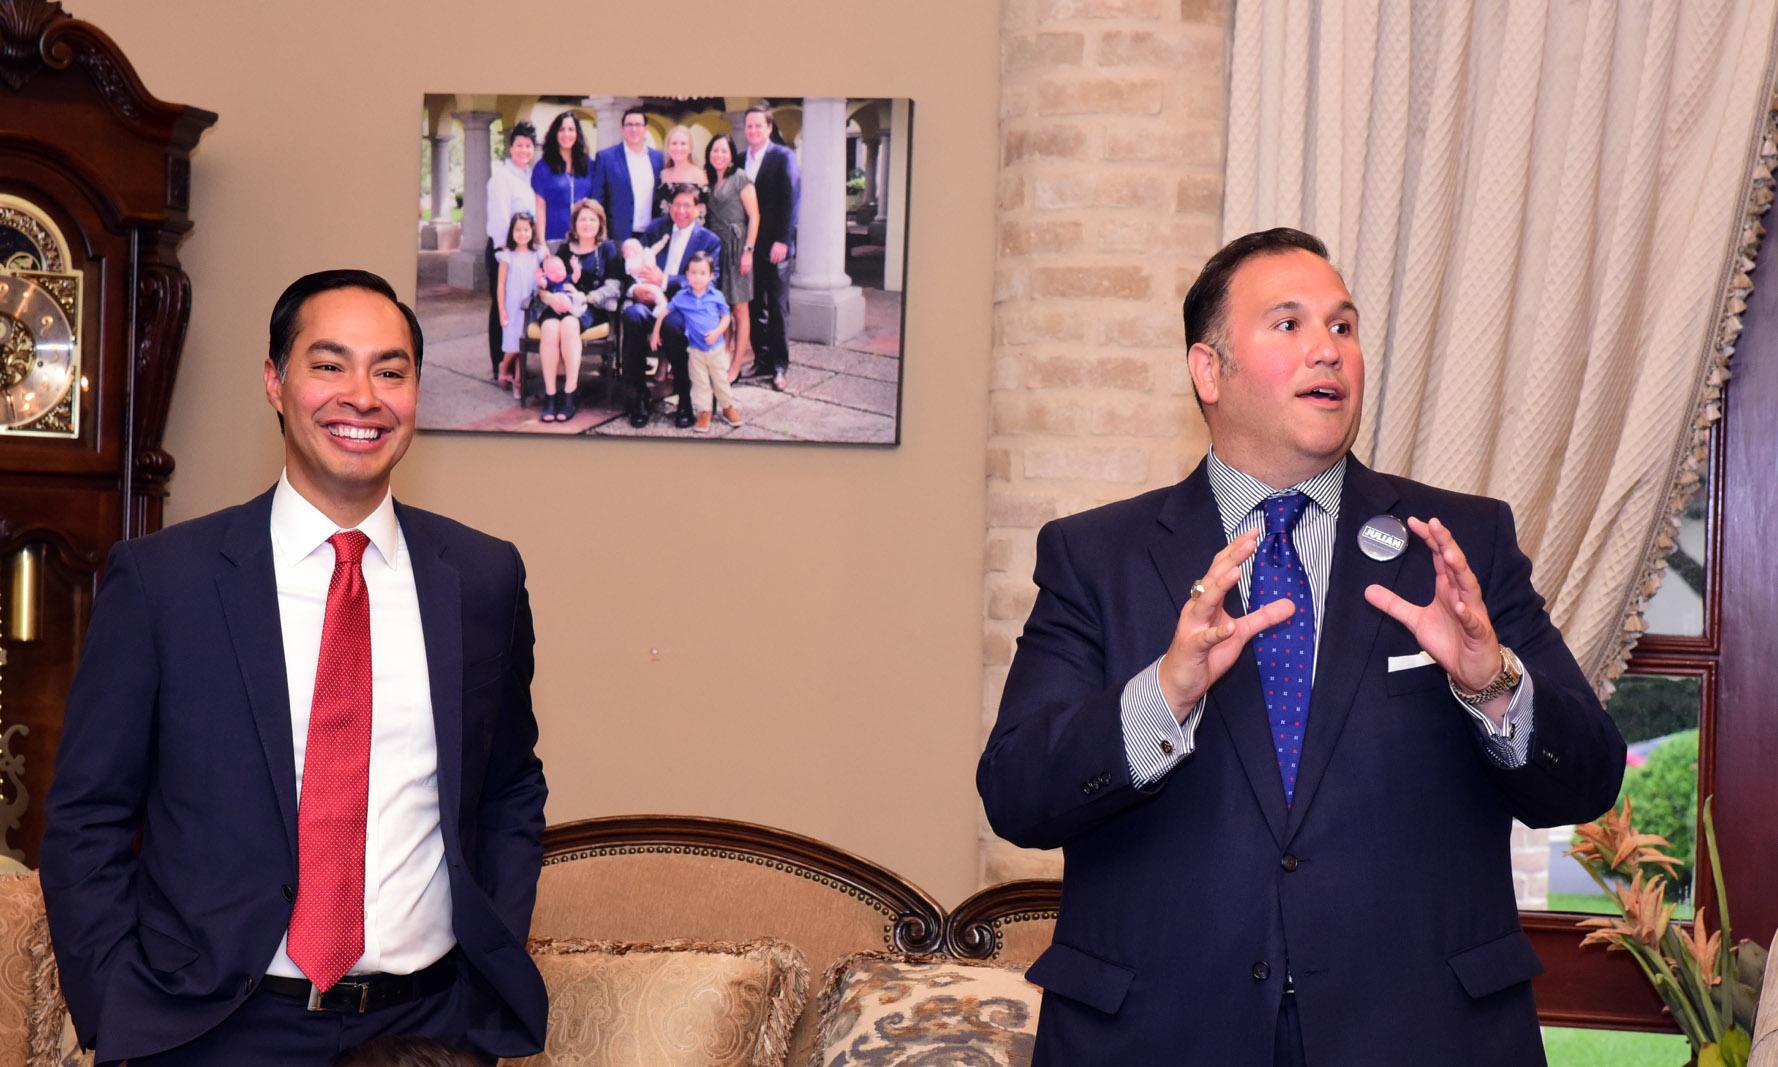 Presidential candidate Julian Castro with NHI Distinguished Alumni Award winner Analco Gonzalez